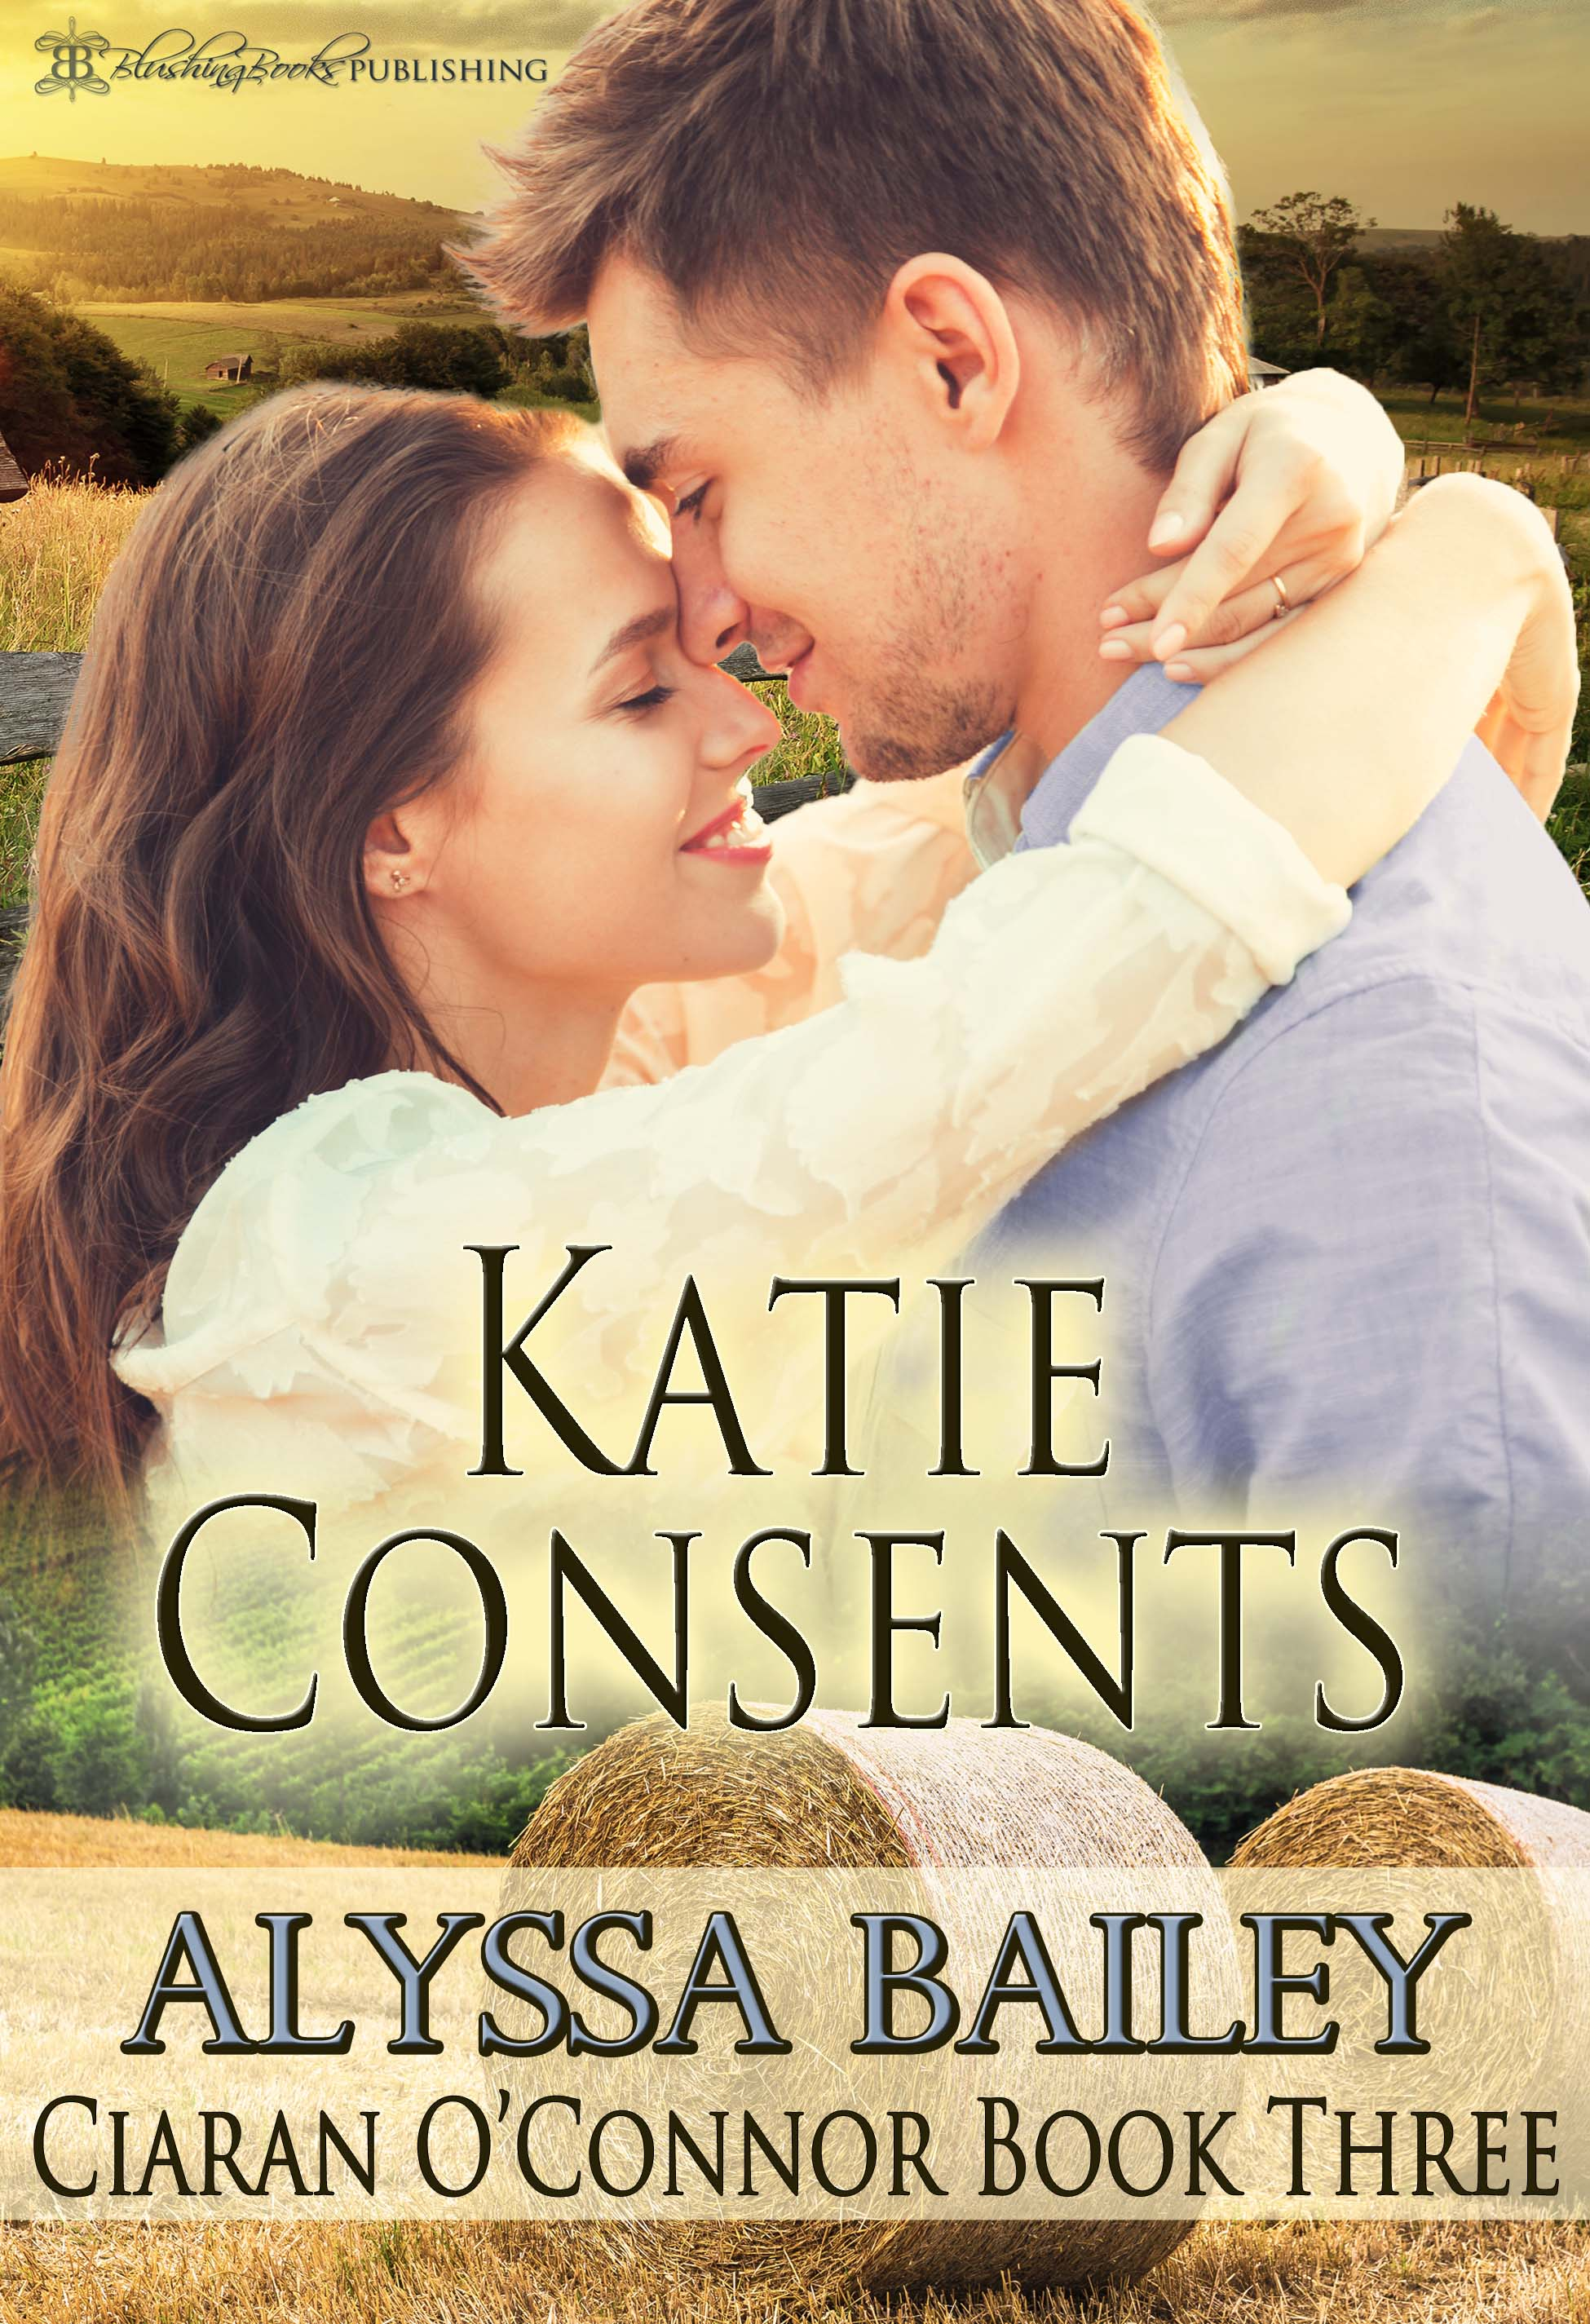 KatieConsents